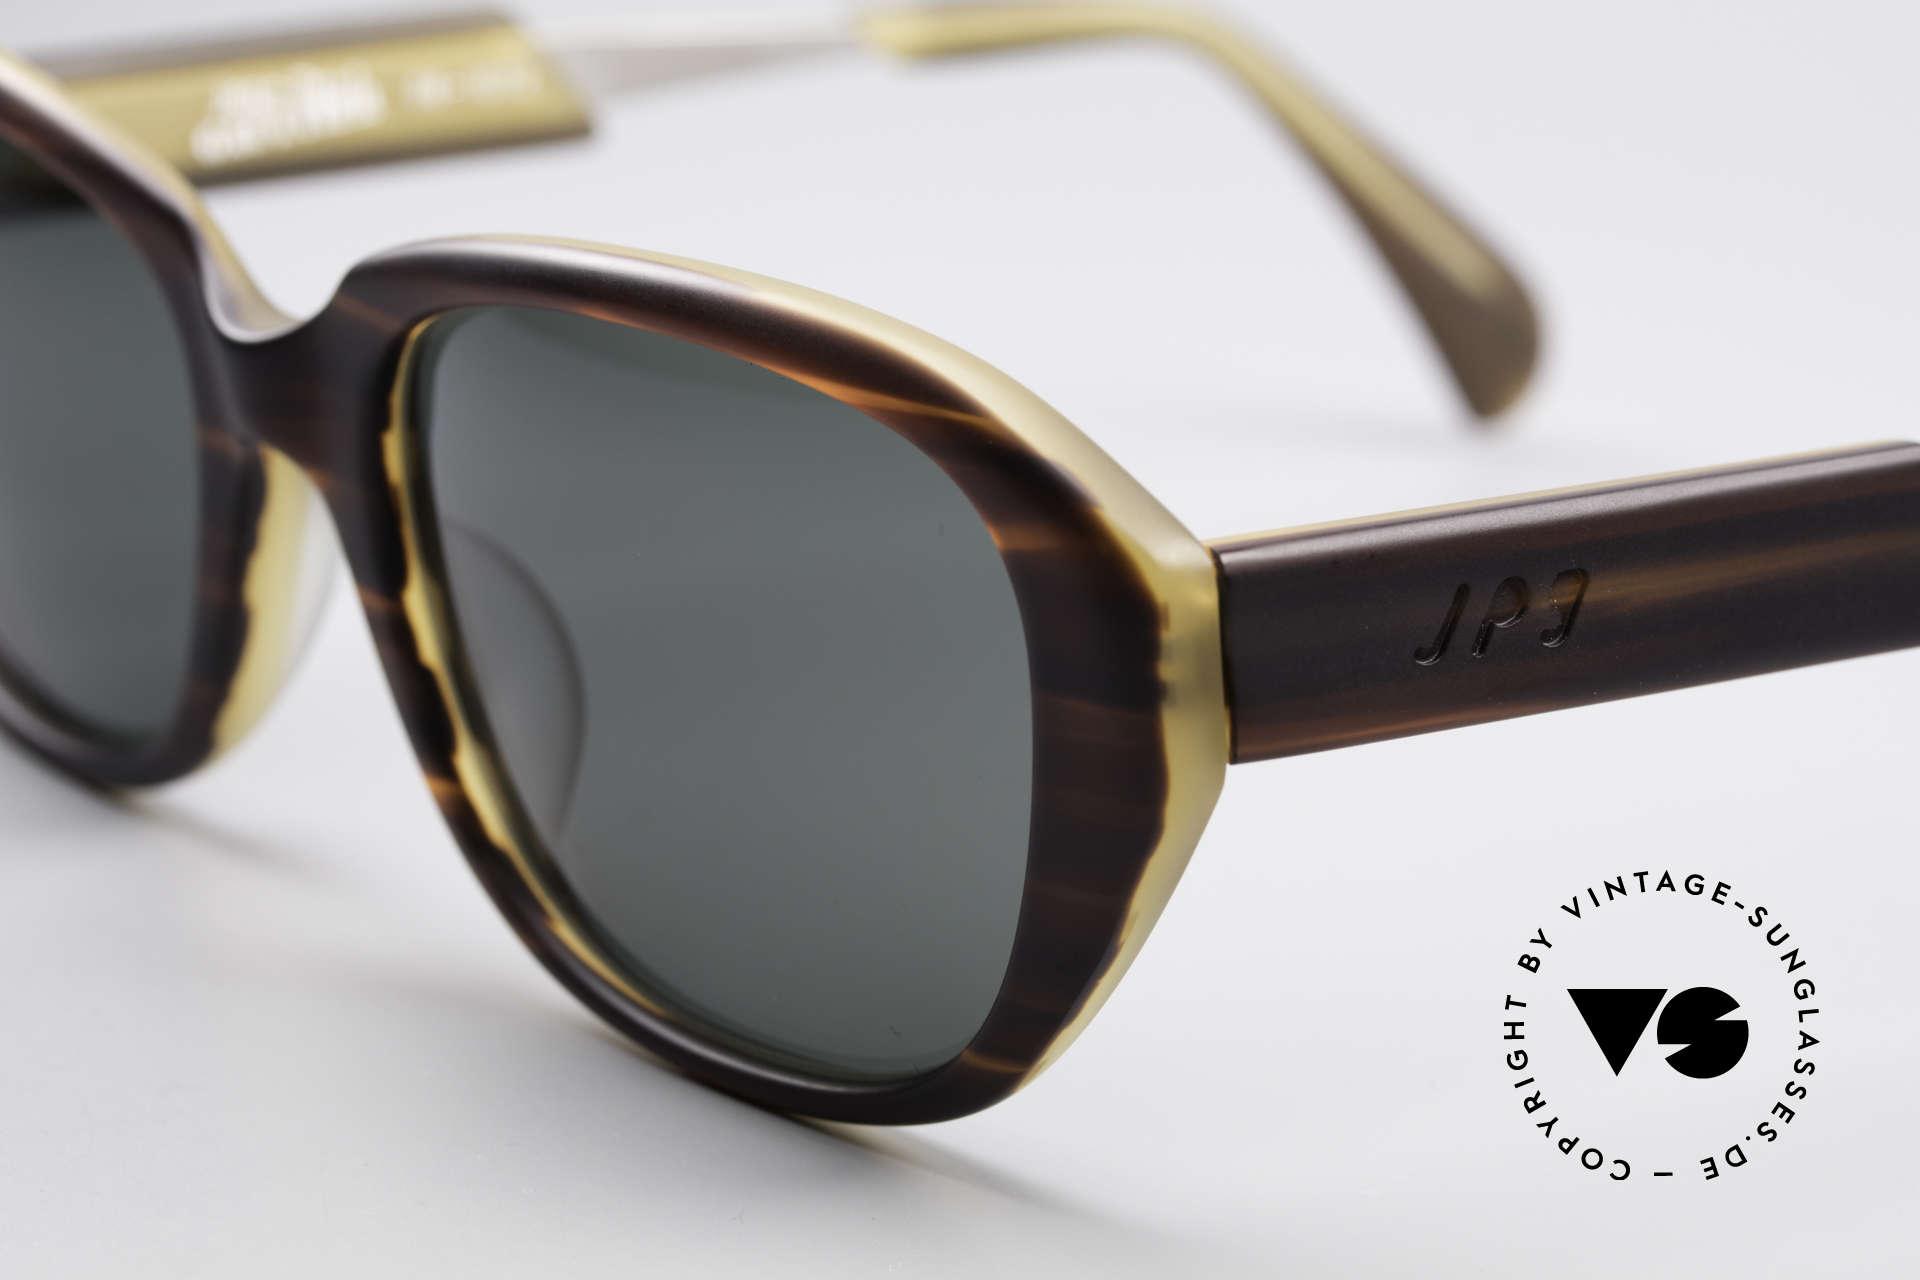 Jean Paul Gaultier 56-1072 90's Designer Sunglasses, unworn, N.O.S. (like all our vintage designer glasses), Made for Men and Women